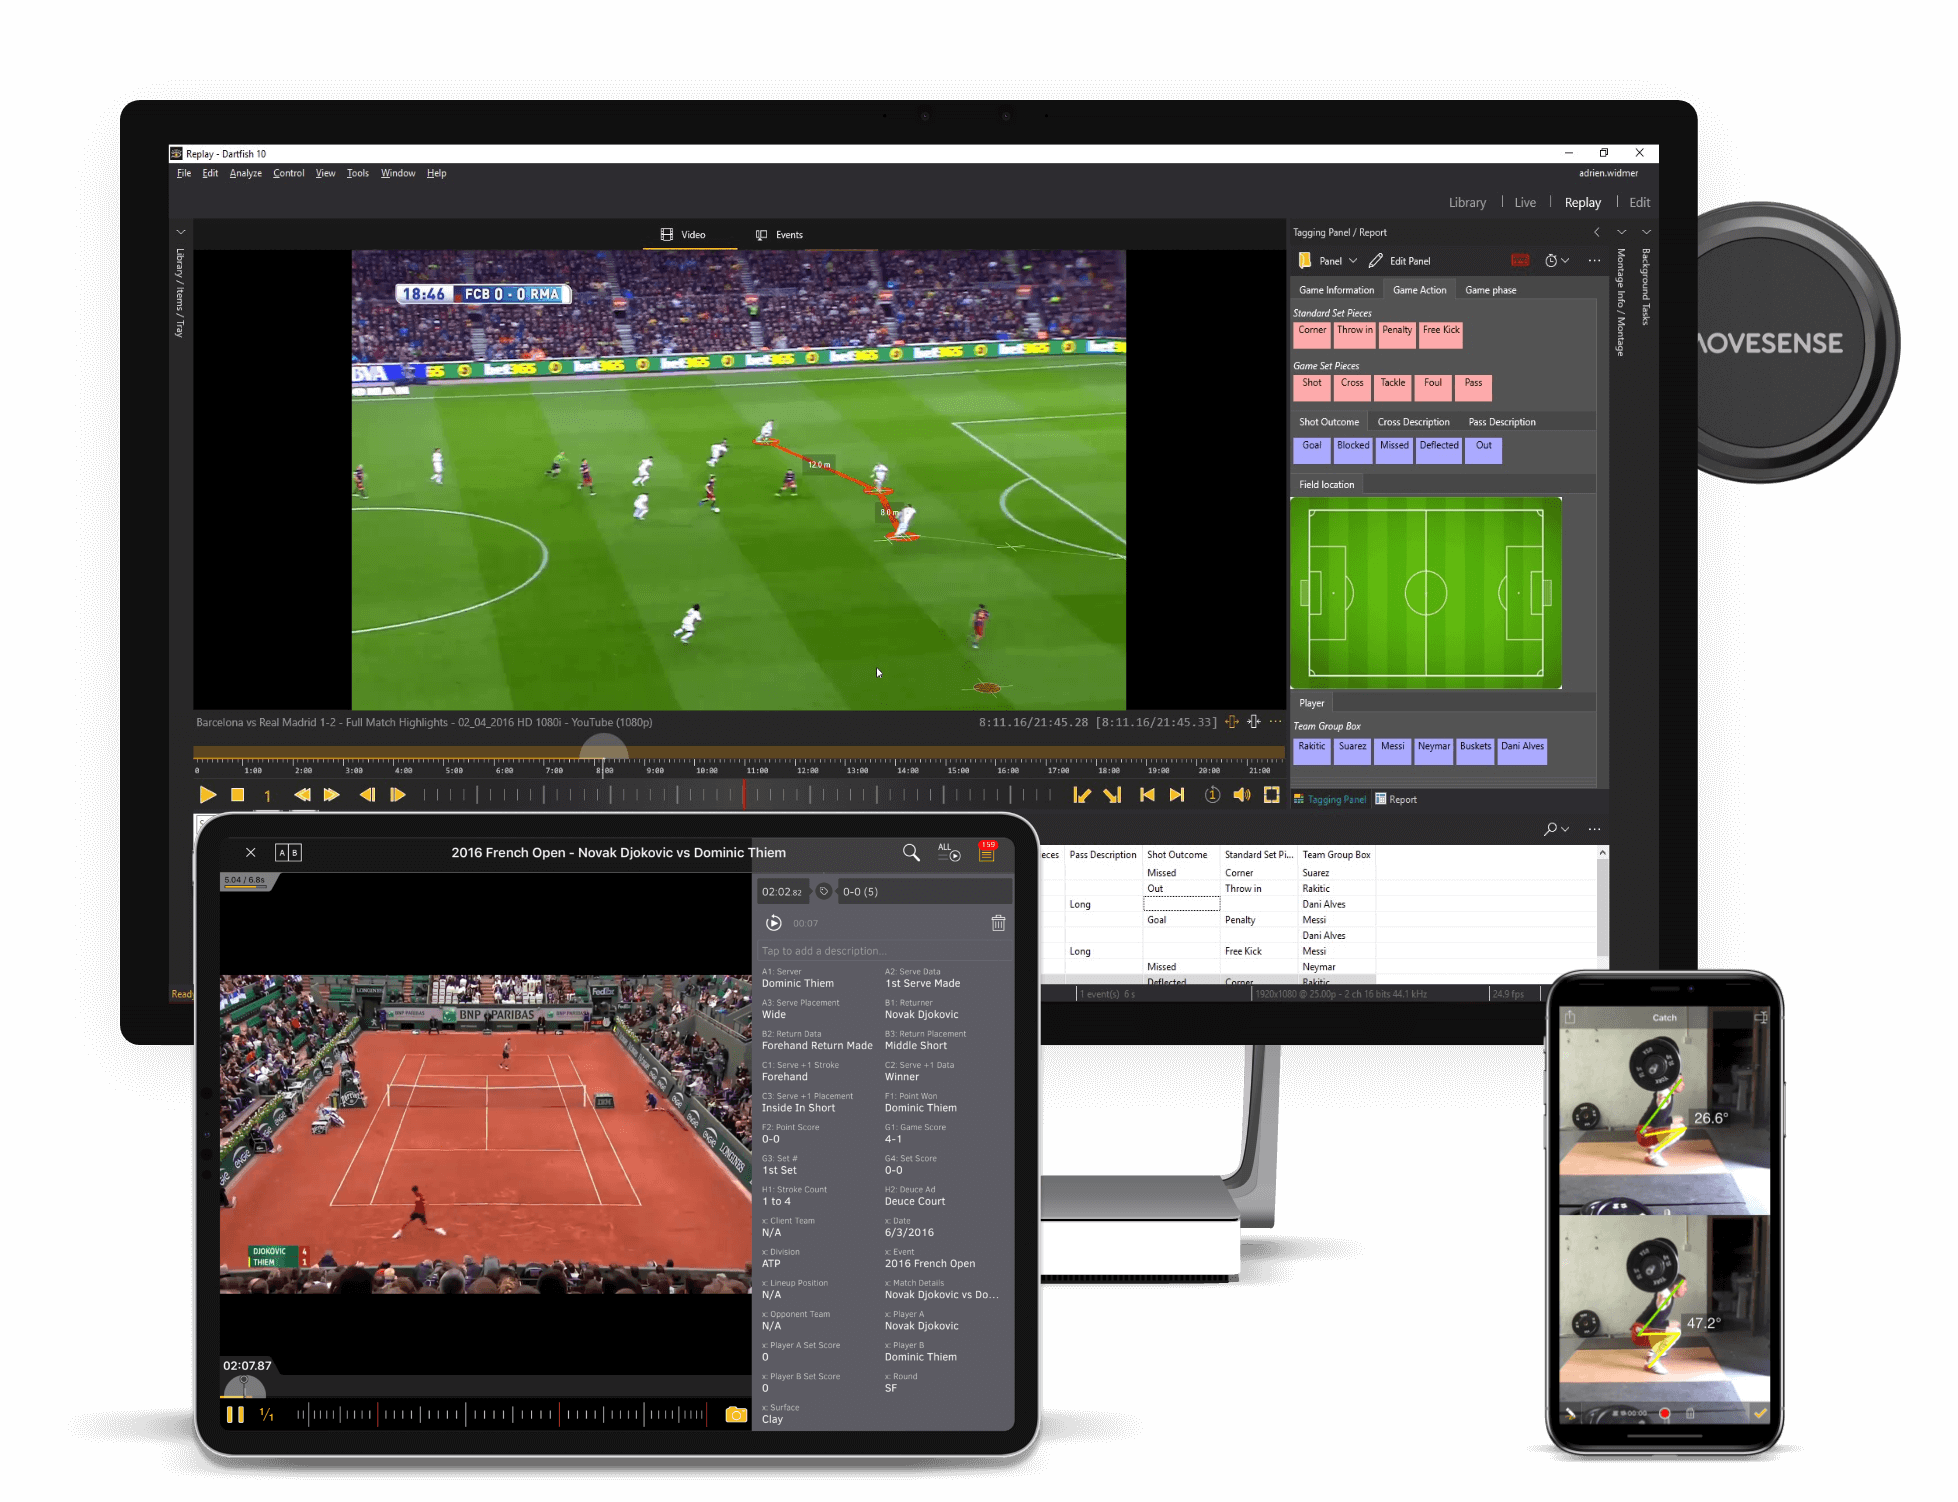 dartfish video analysis